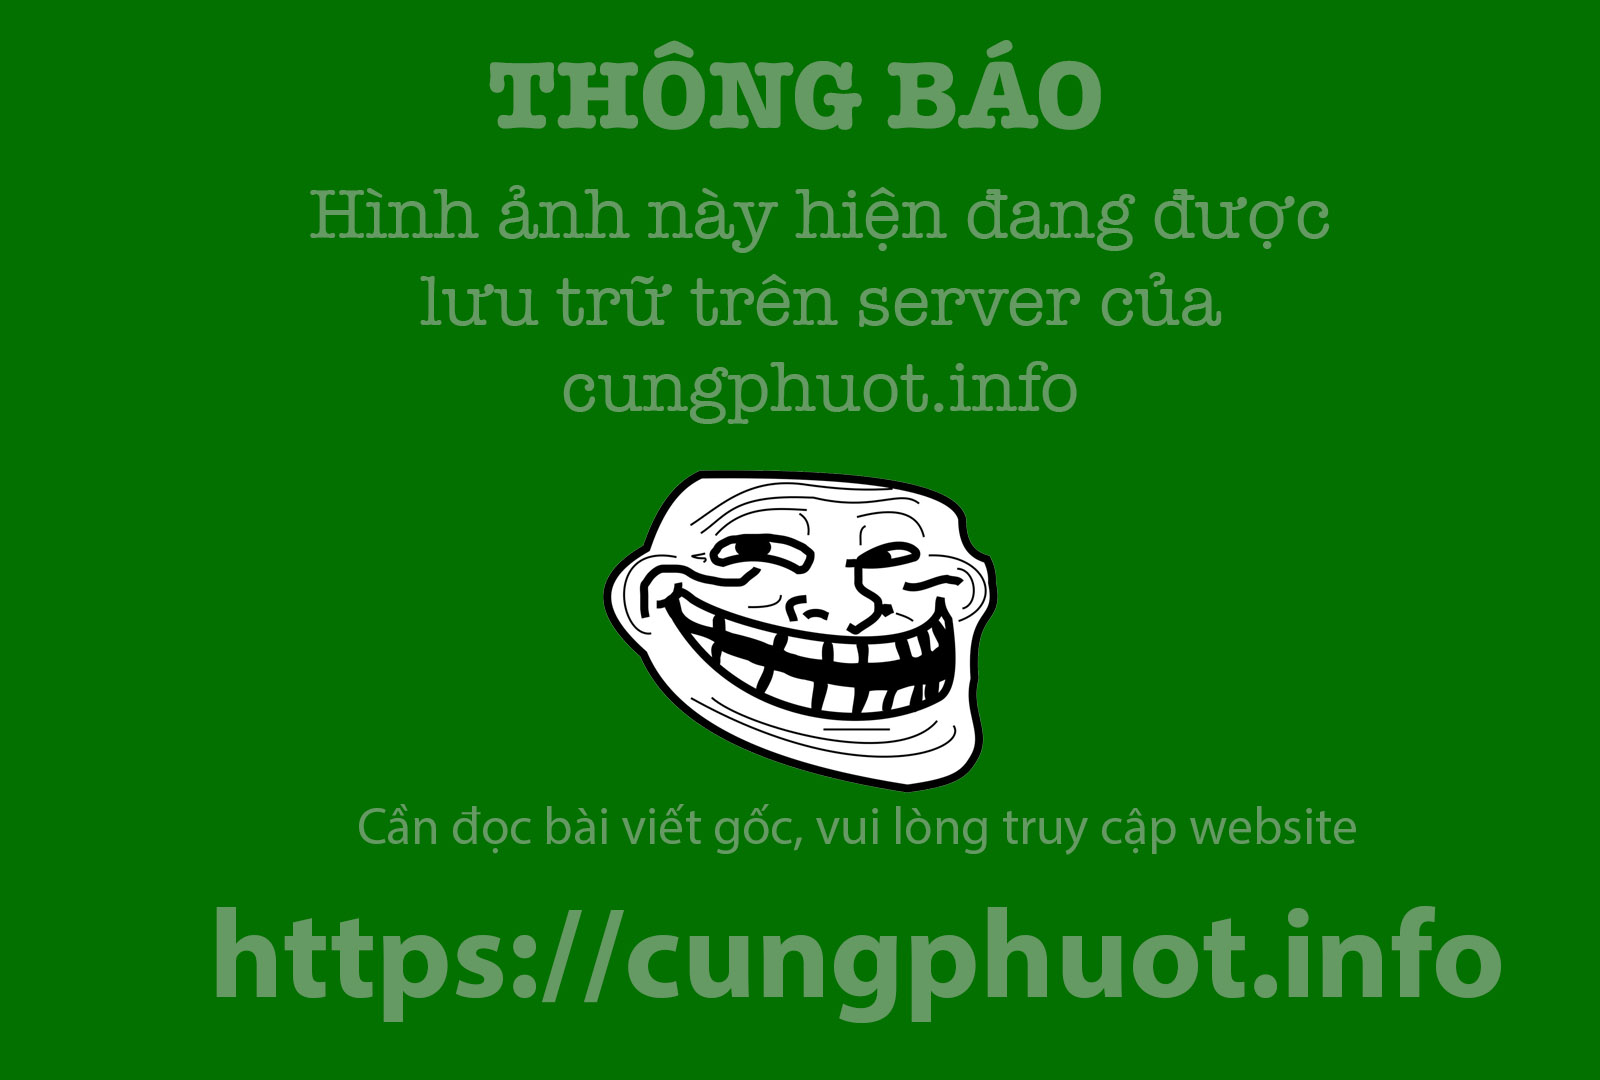 Co do Hue dep la trong suong mu hinh anh 4